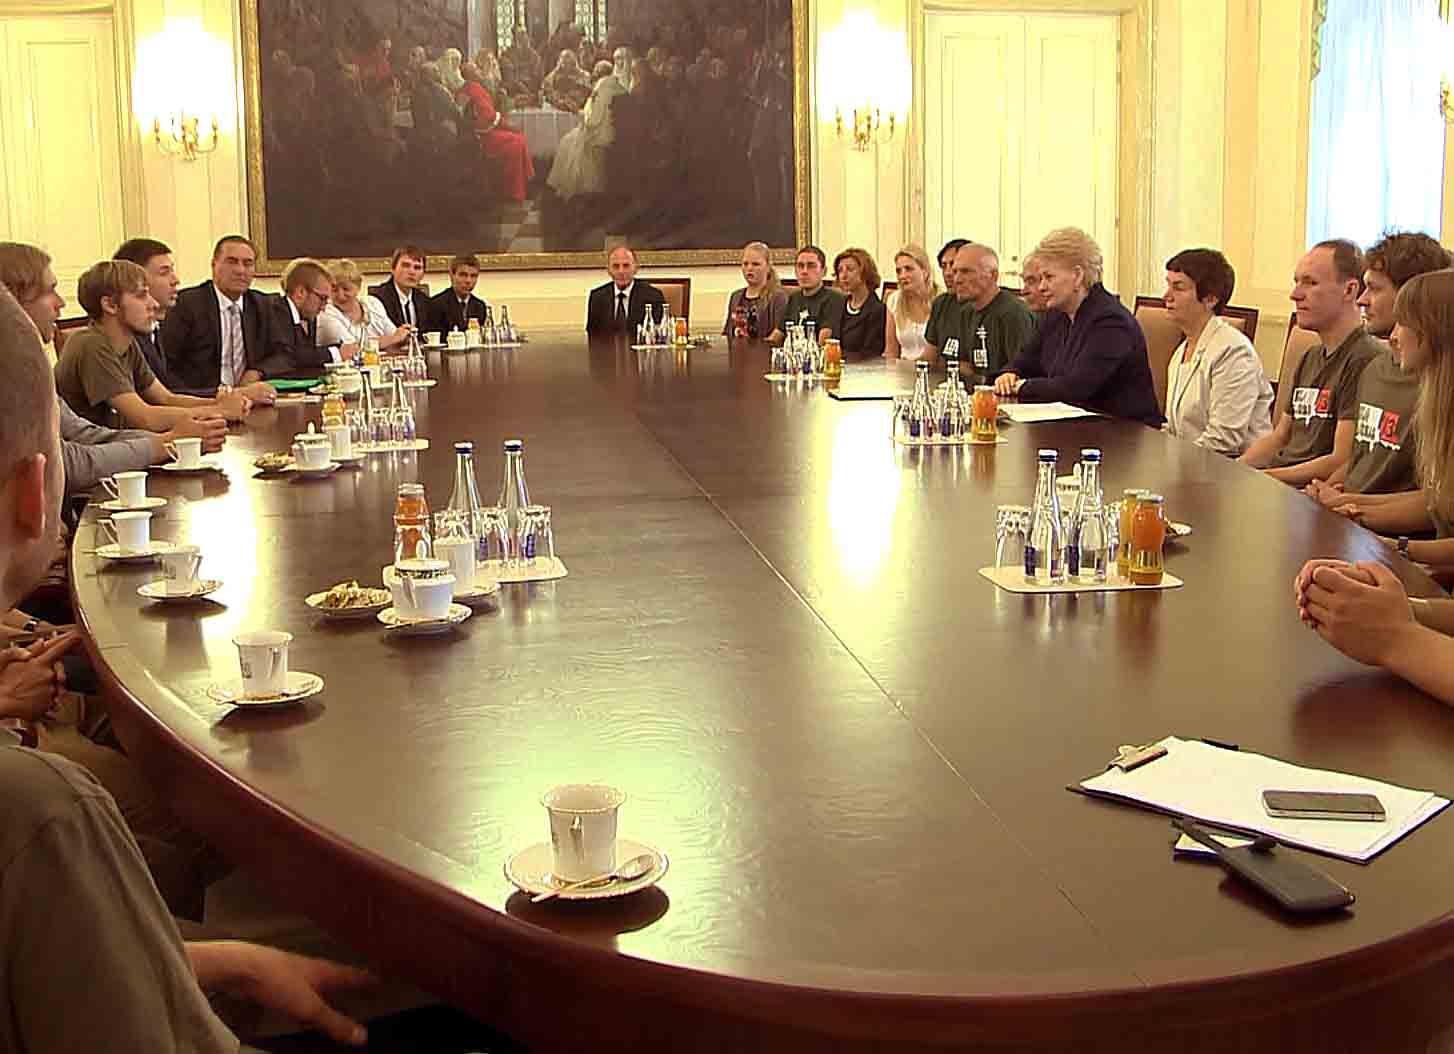 Diskusijos akimirka prezidentūrojs | Alkas.lt nuotr.